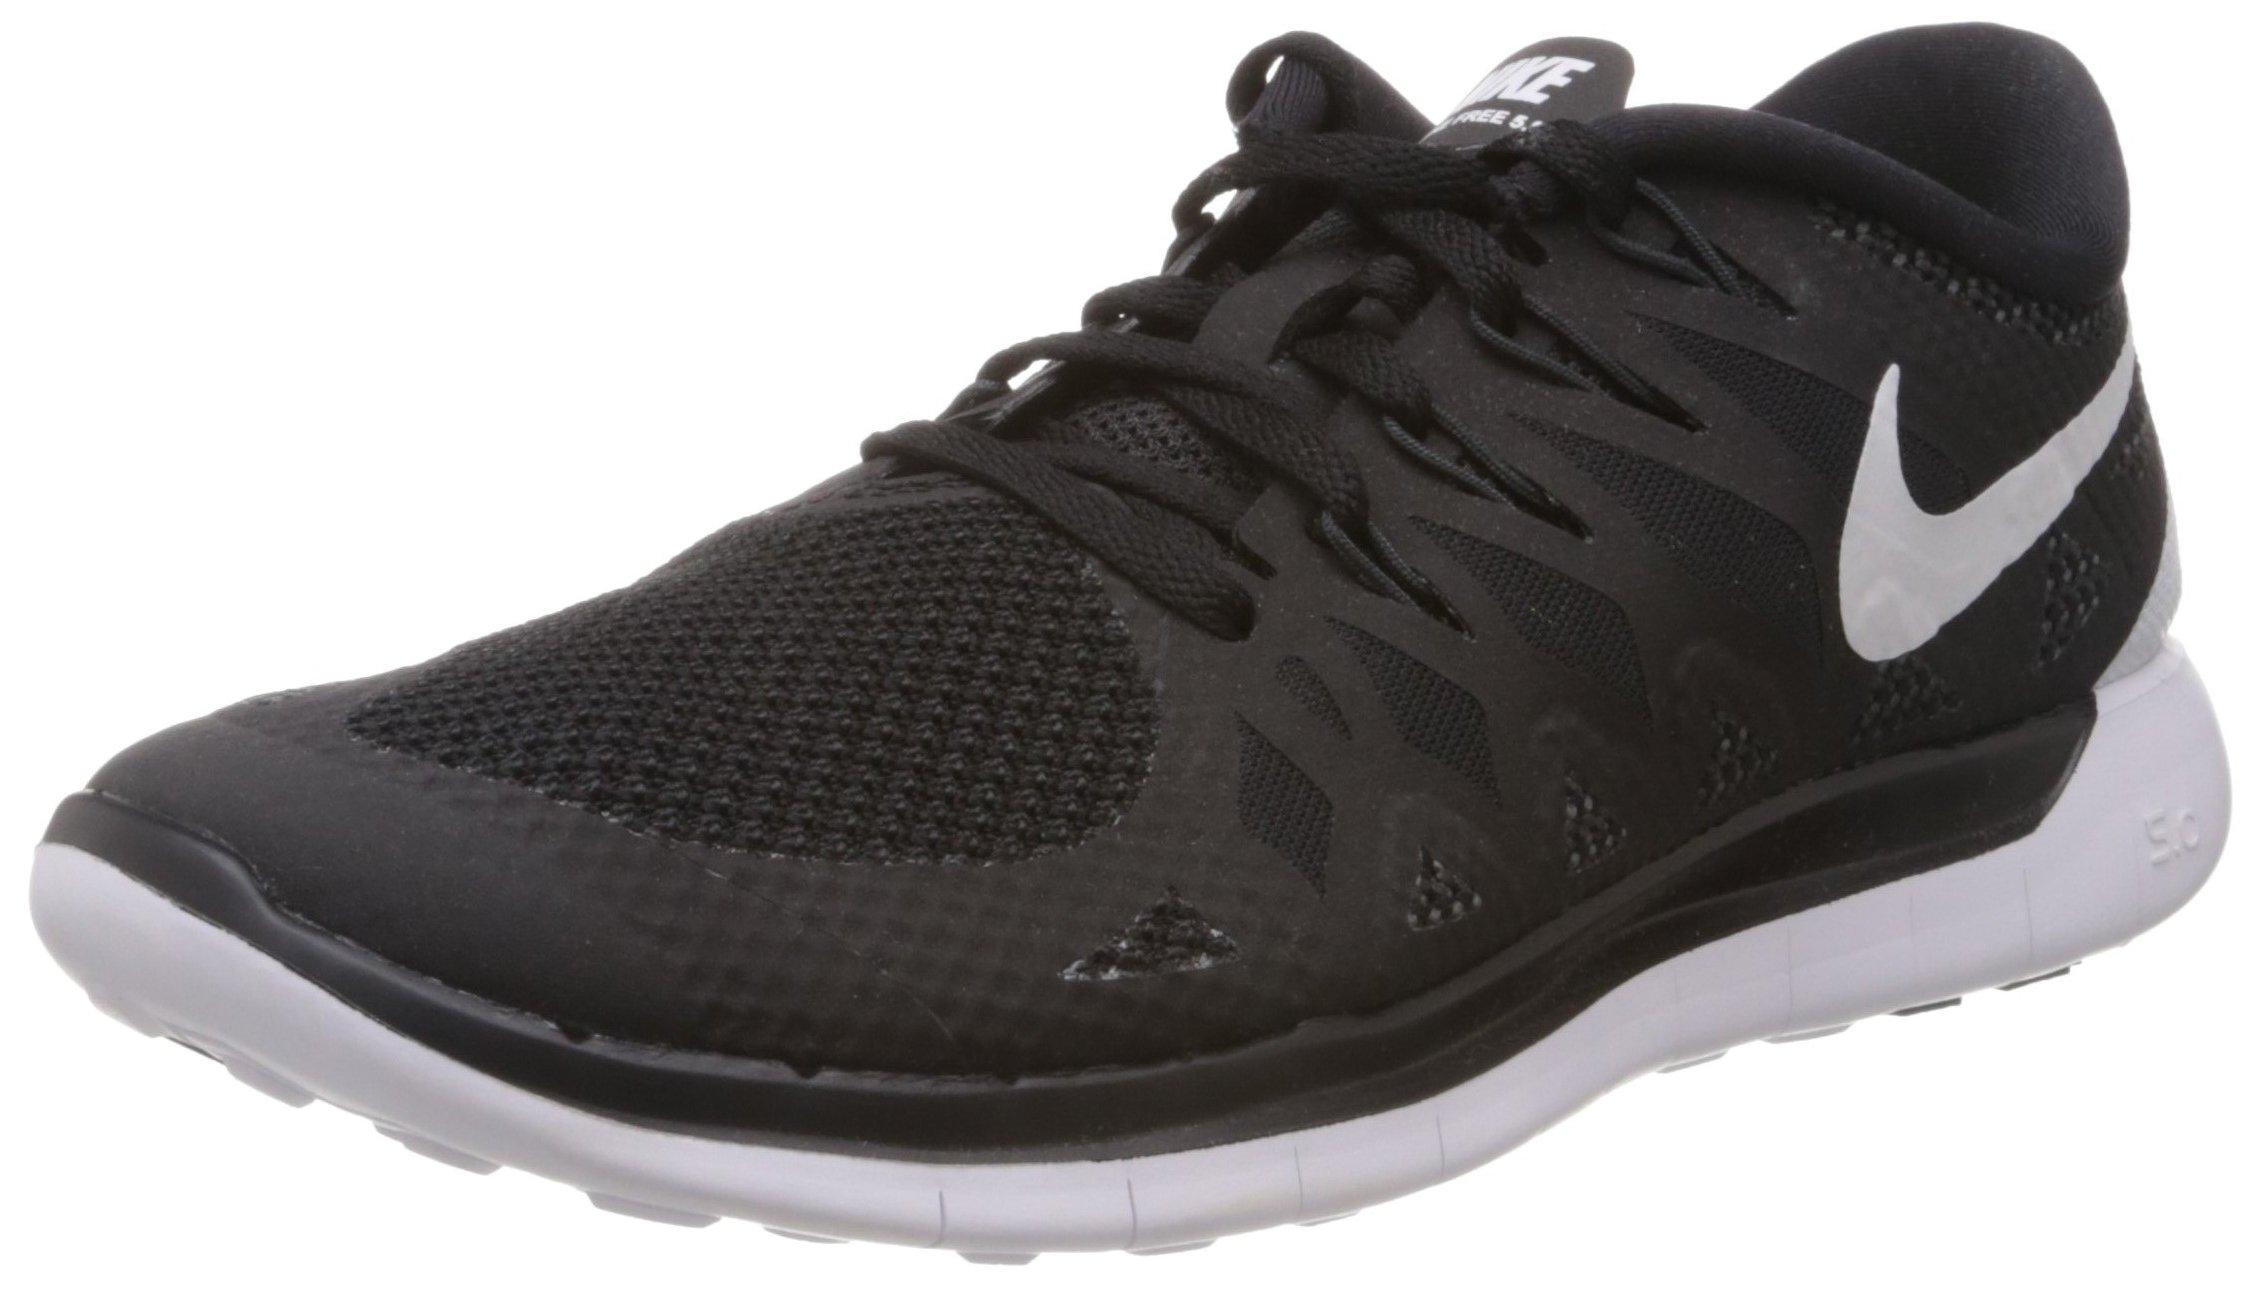 Nike Free 5.0 '14 (Black/Anthracite/White) Men's Running Shoes (Black/Anthracite/White)